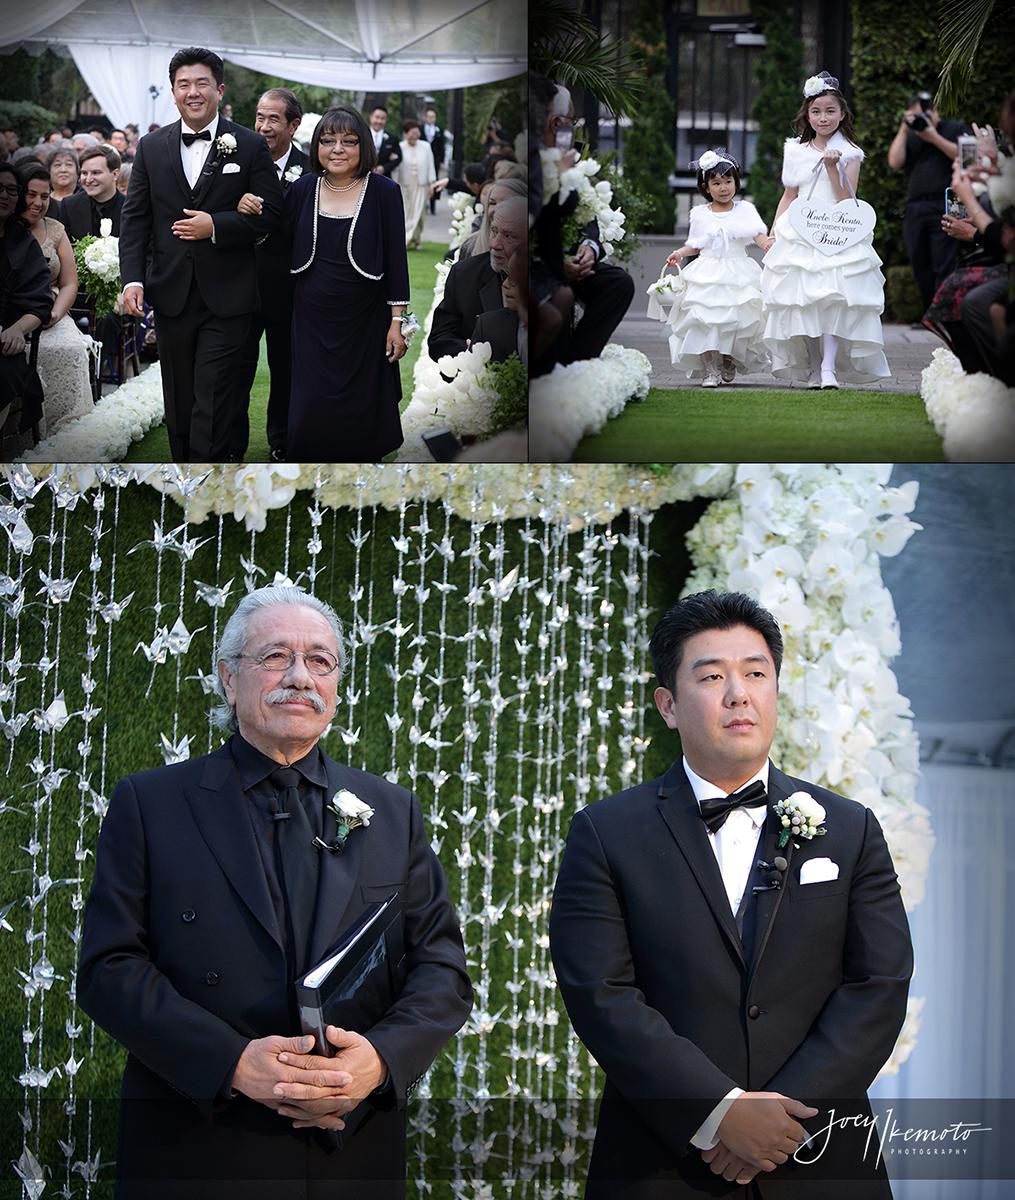 Vibiana-Los-Angeles-Weddings_0029_Blog-Collage-1452302915806